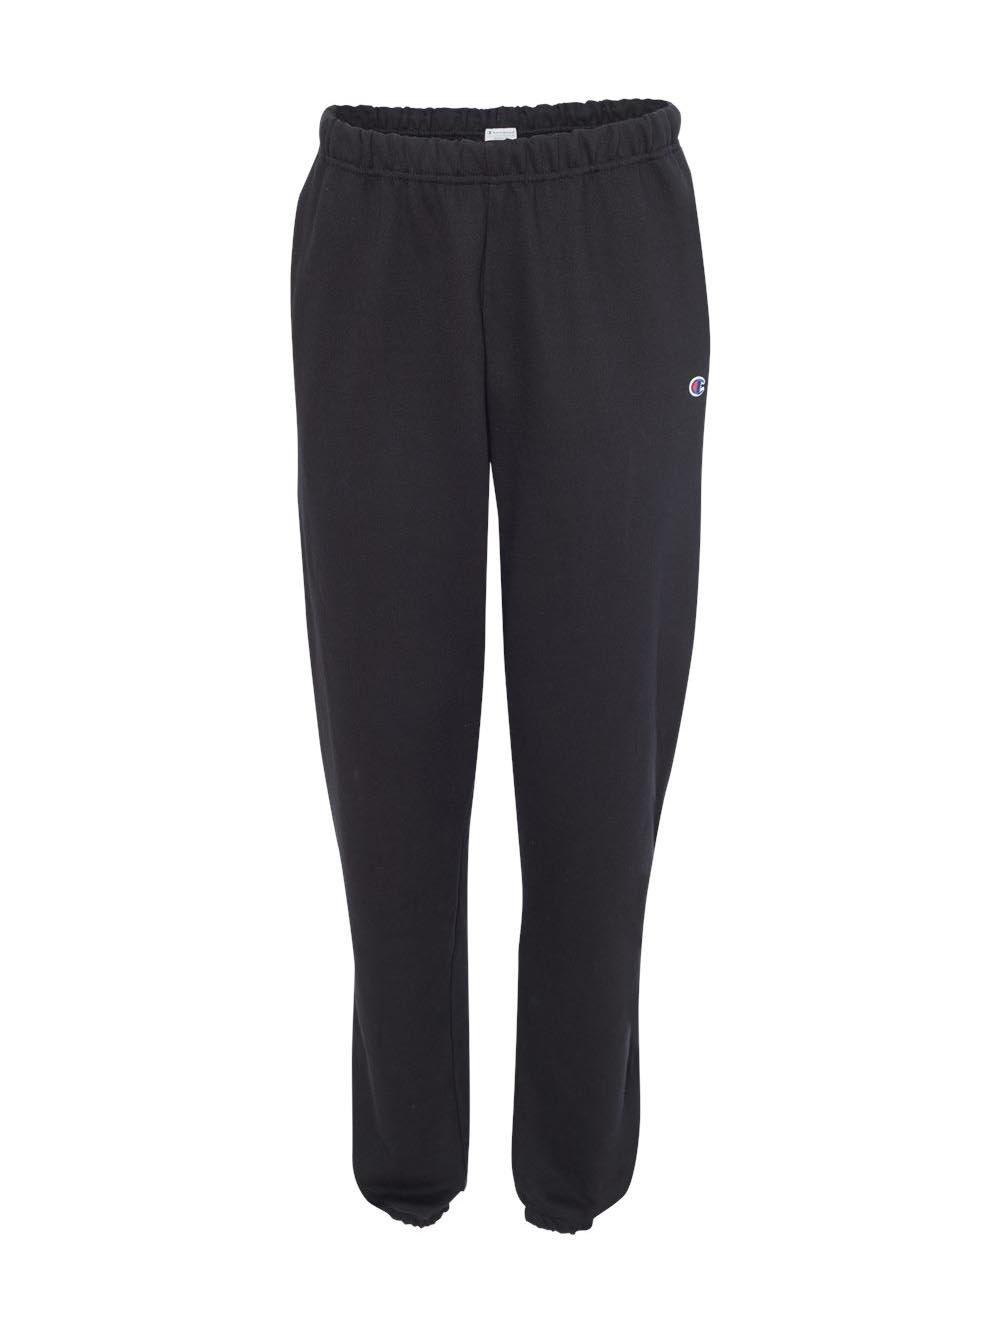 Champion Reverse Weave Adult Pant, RW10, 2XL, Black